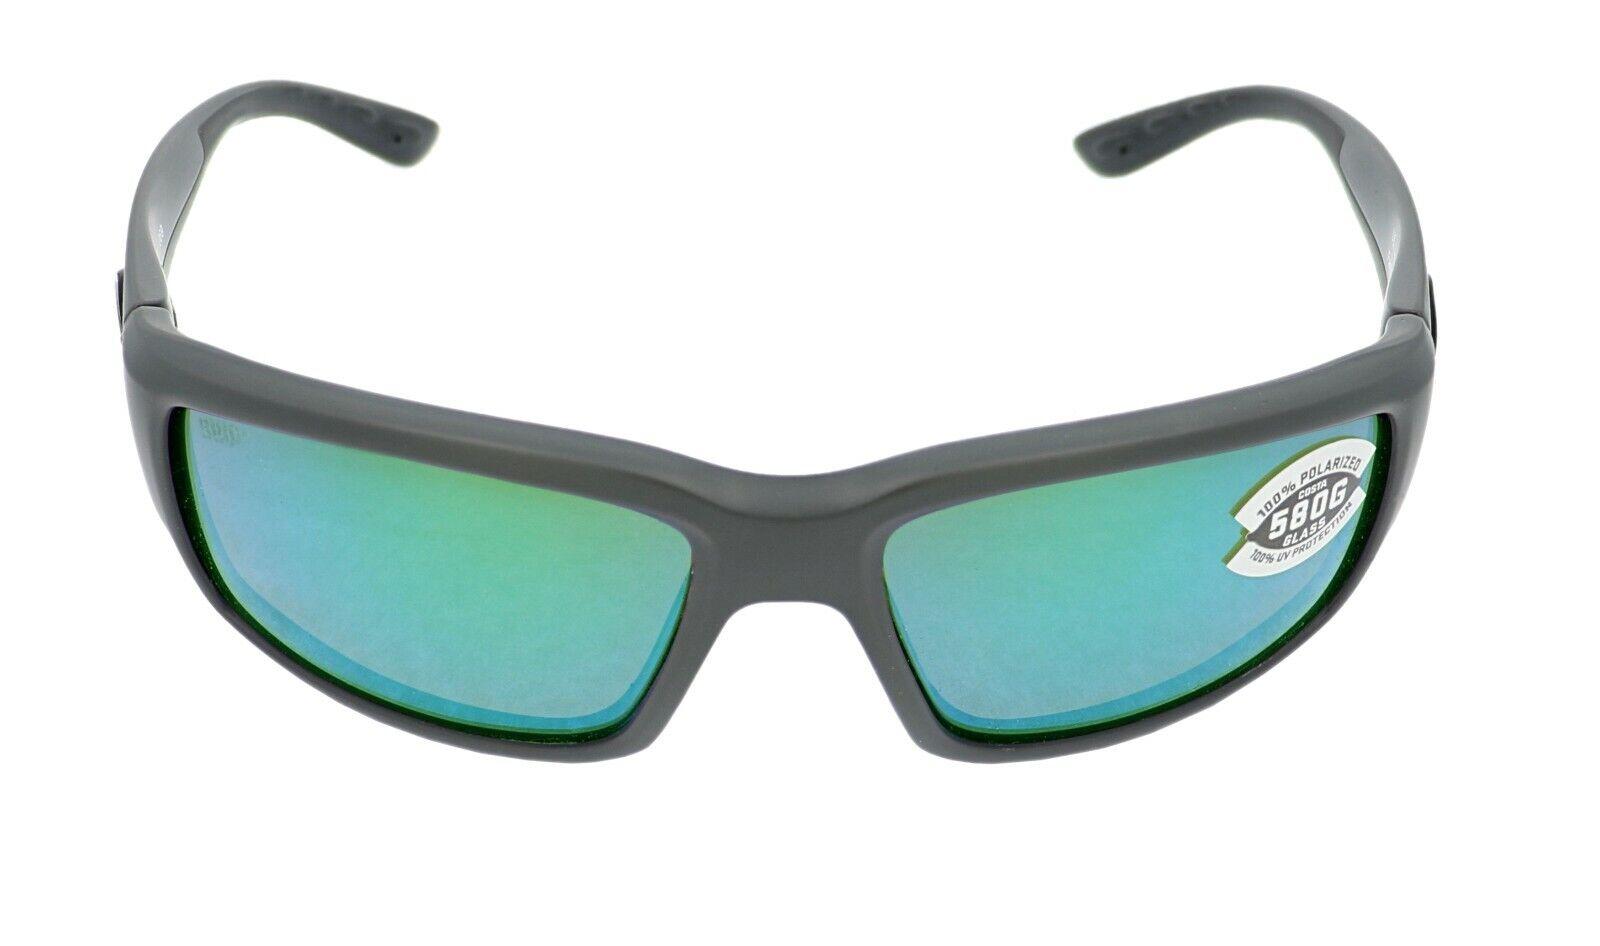 Costa Del Mar FANTAIL Green Mirror Sunglasses 580G Glass TF 11 OGMGLP